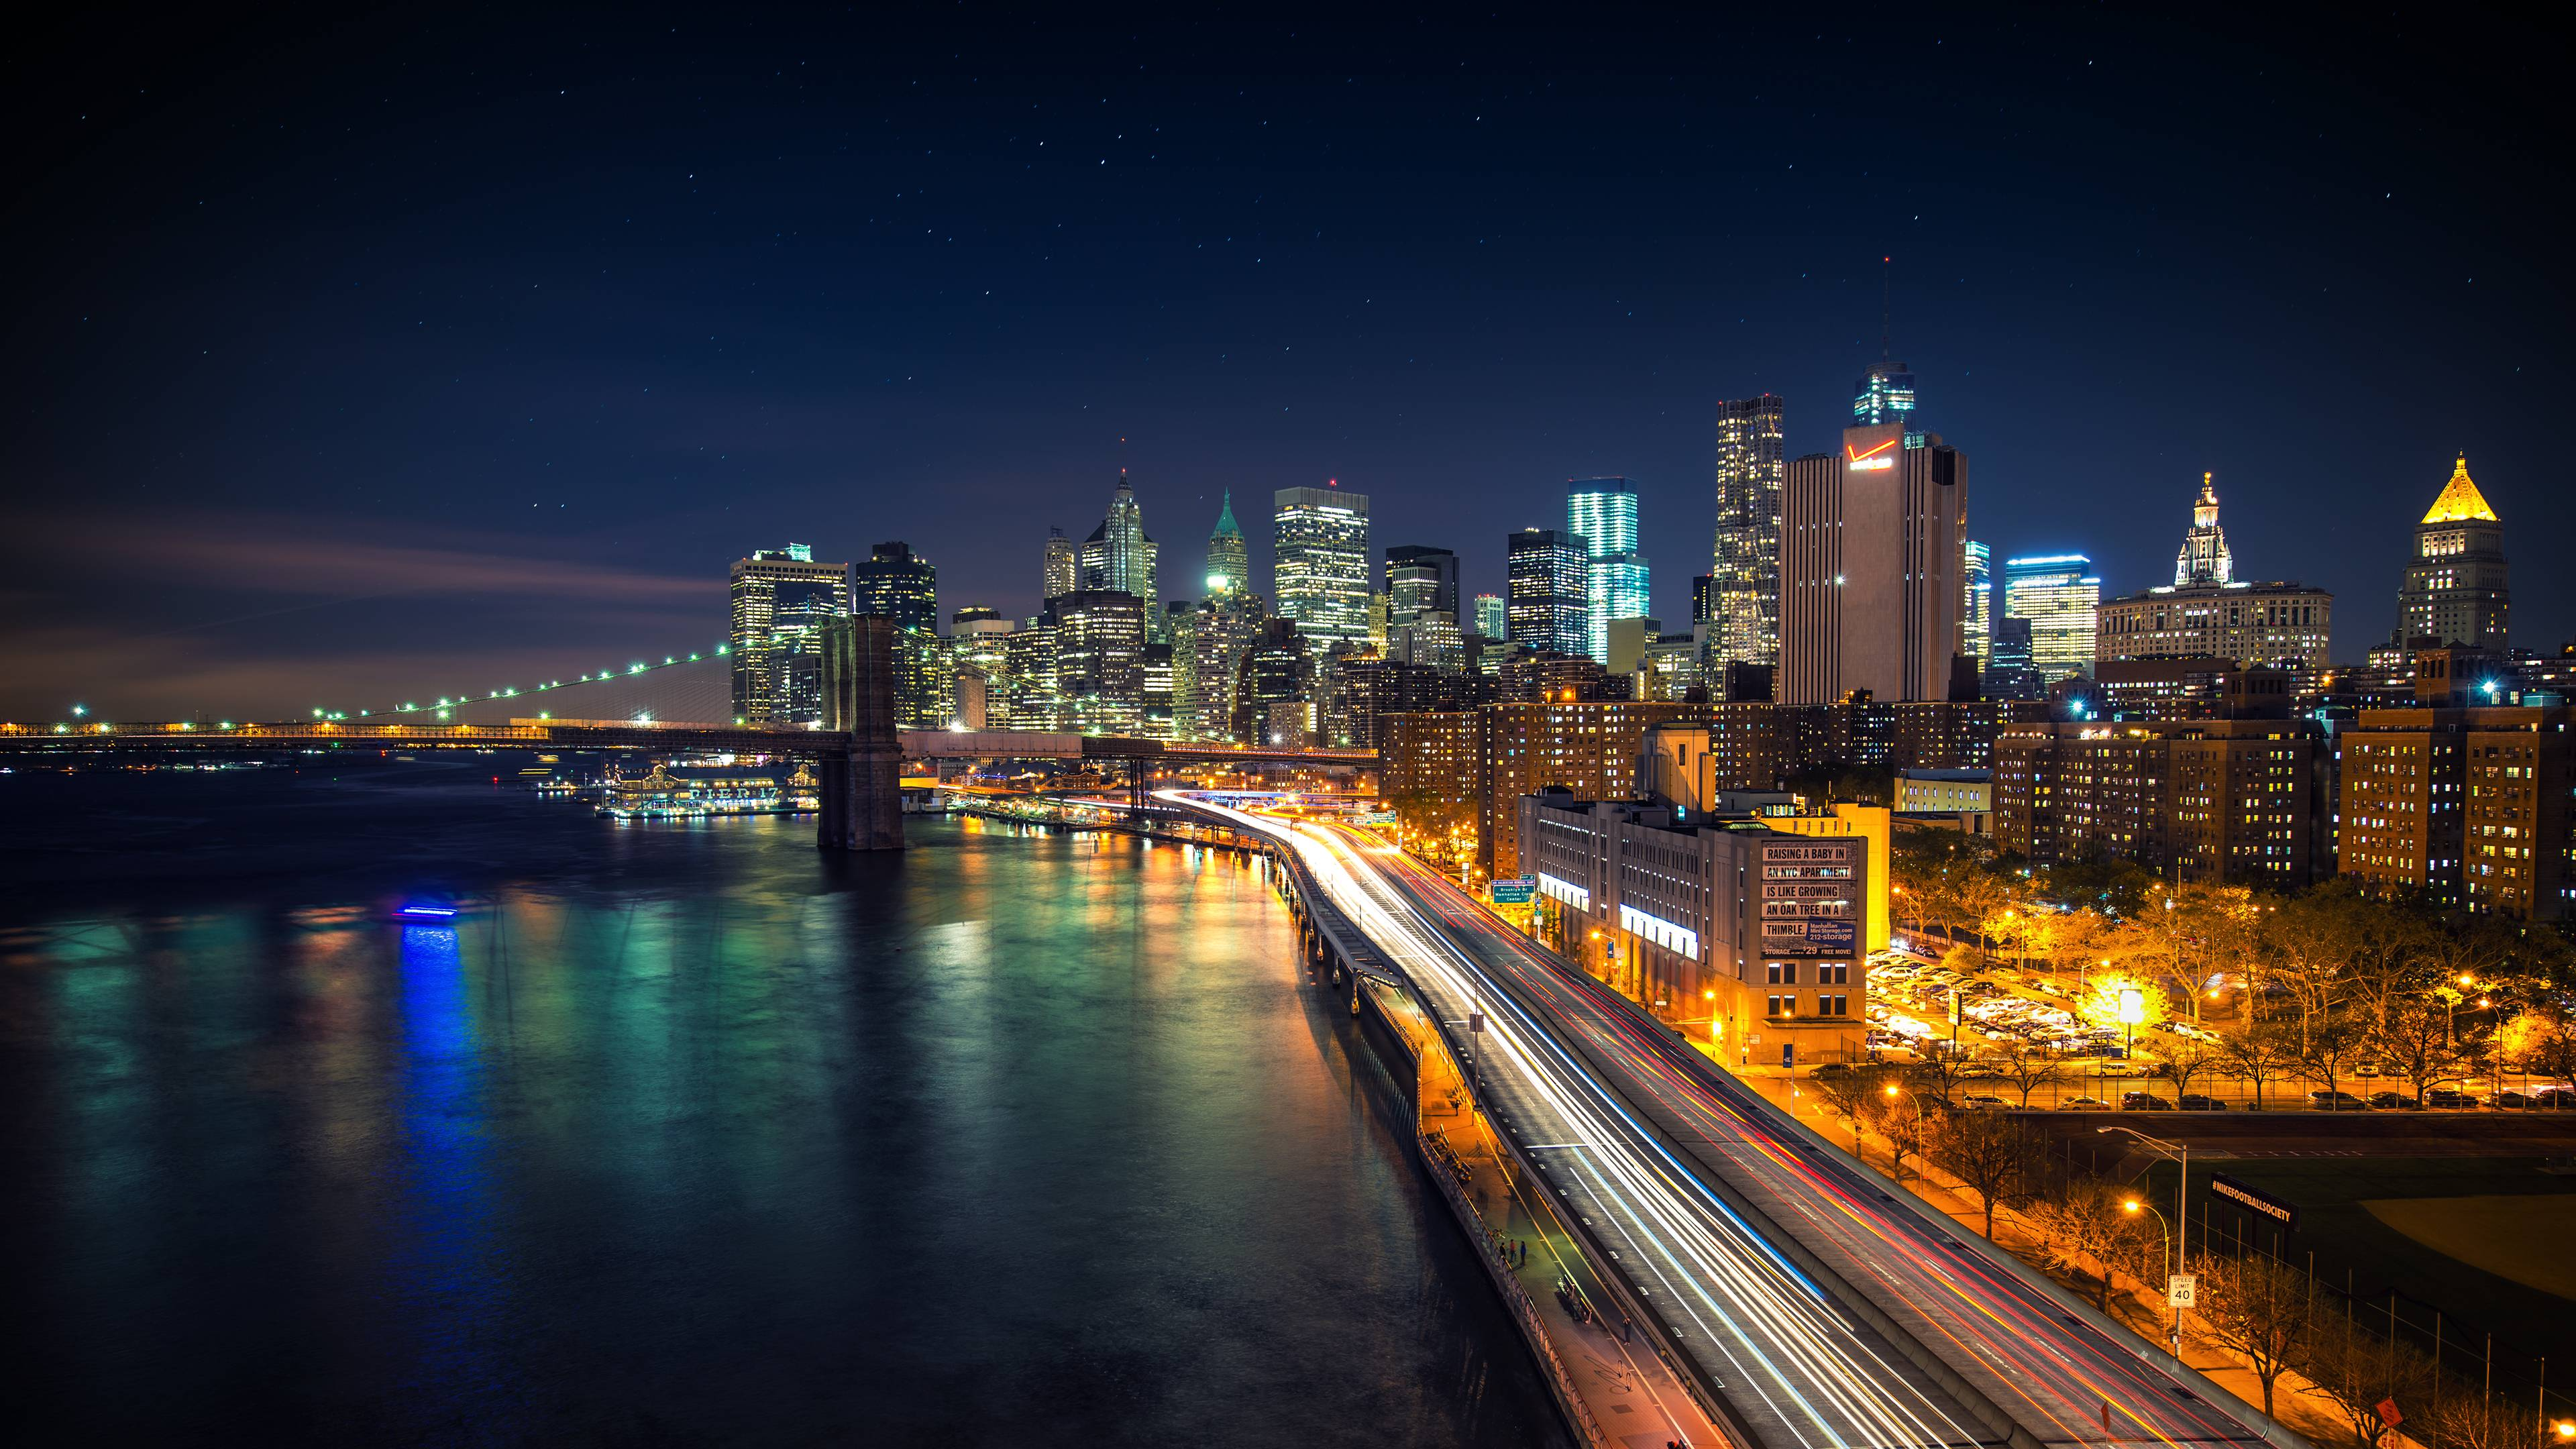 4K Wallpaper City Nighty City Lights, hd walepaper, free wallpaper